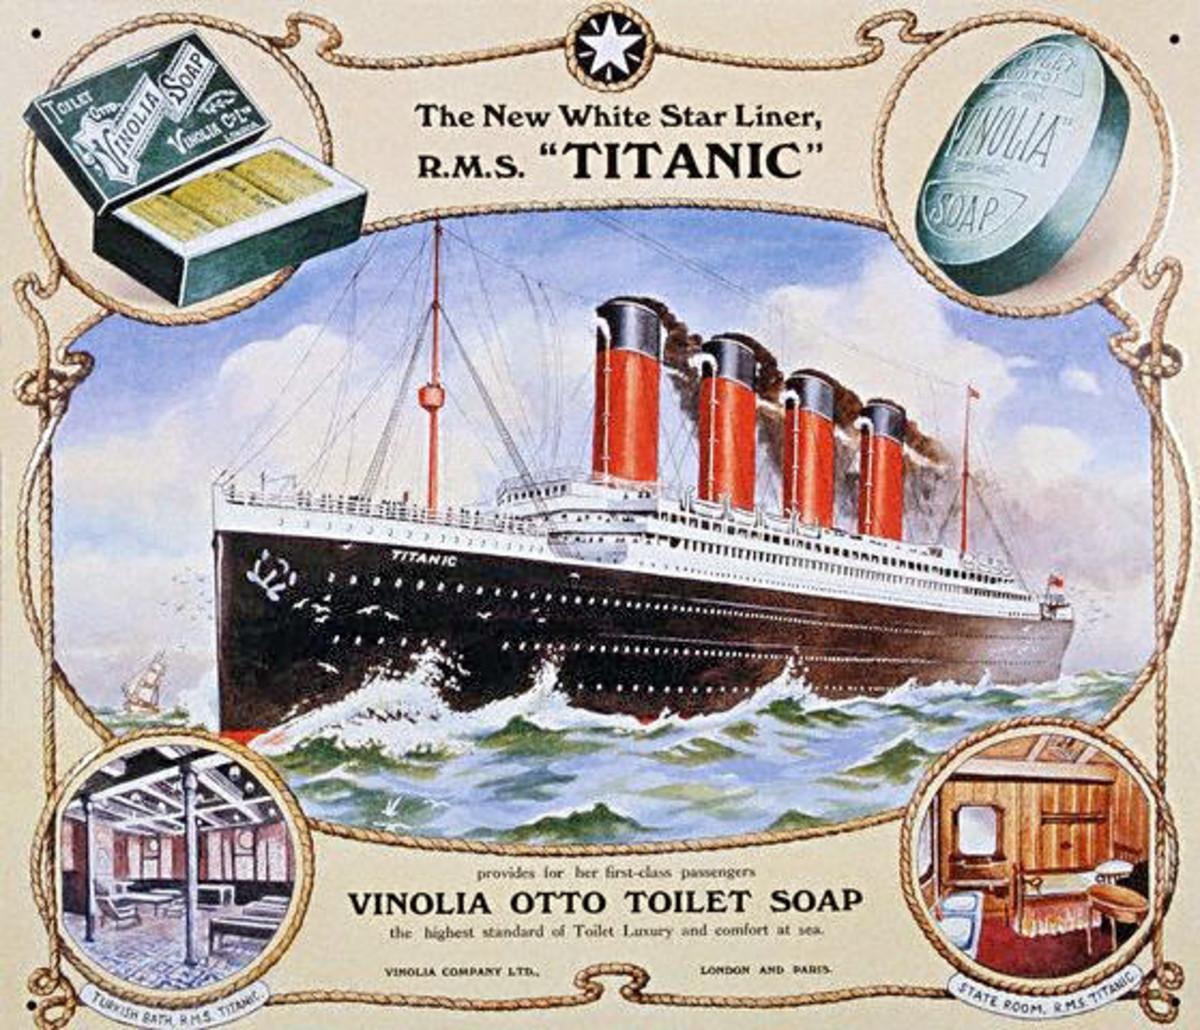 Public domain. See: http://en.wikipedia.org/wiki/File:RMS_Titanic_1.jpg